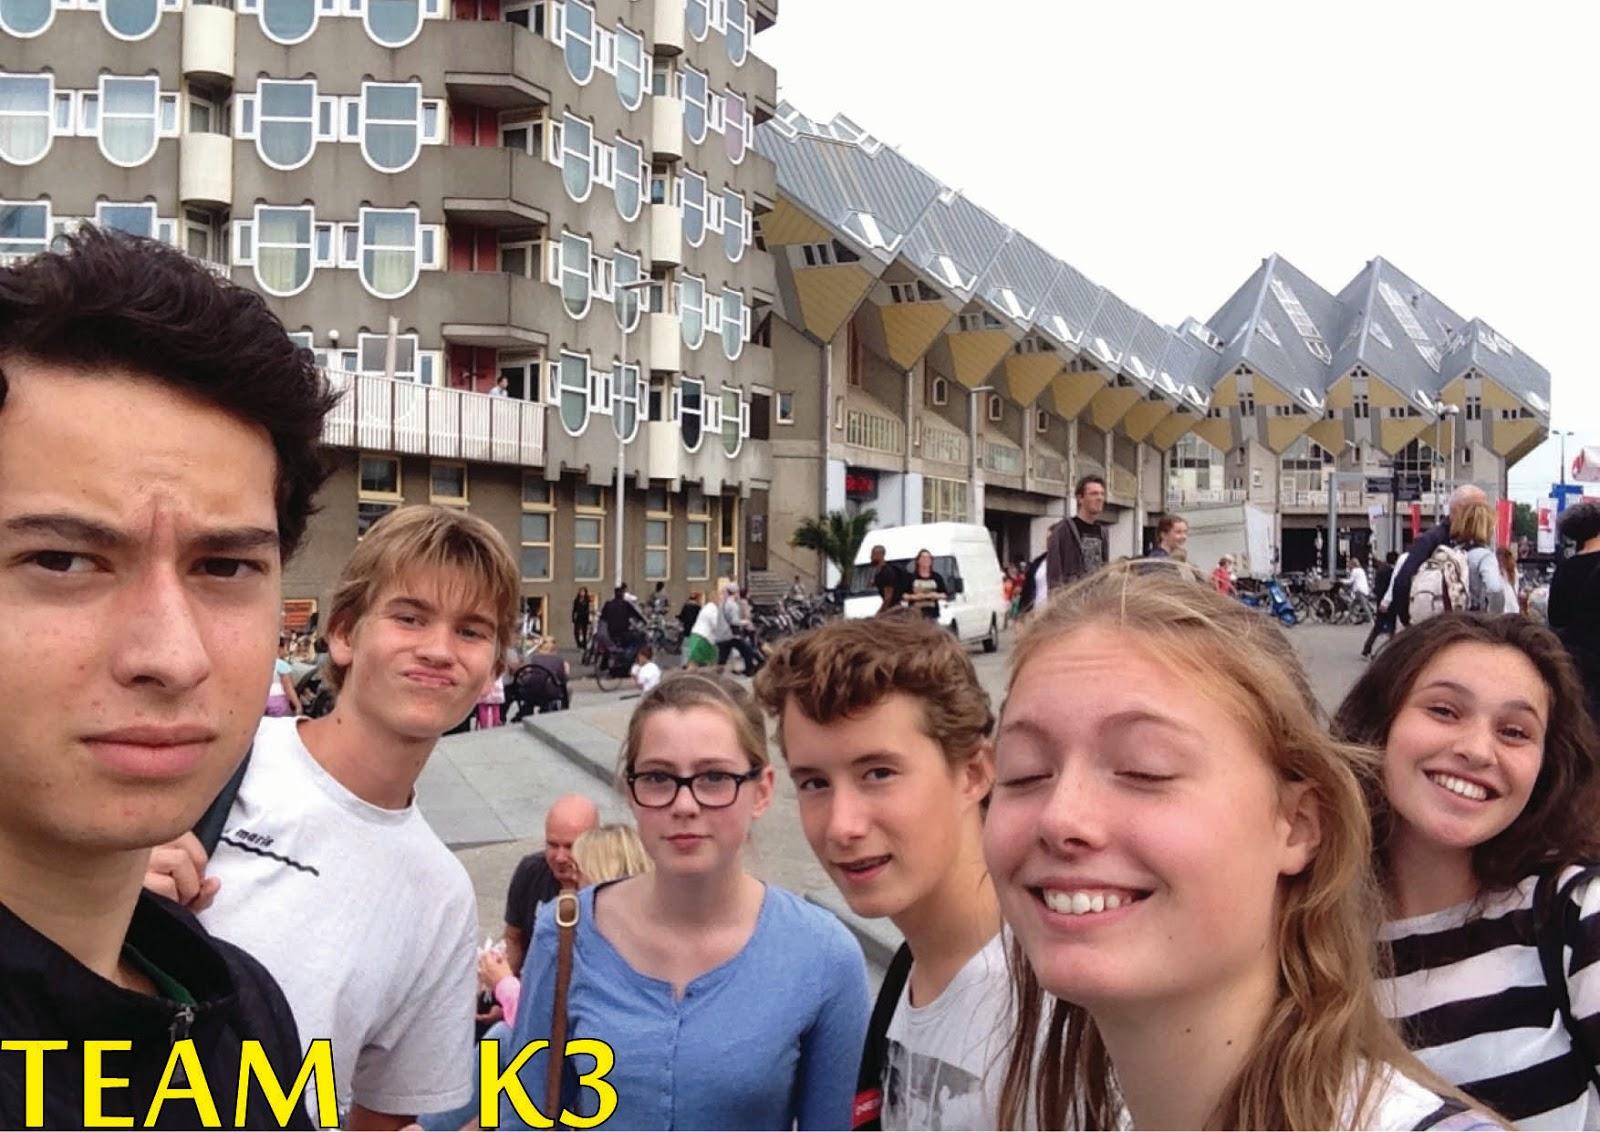 2014 - Special Fun Opkomst - Maasgroep18 & Stella Maris